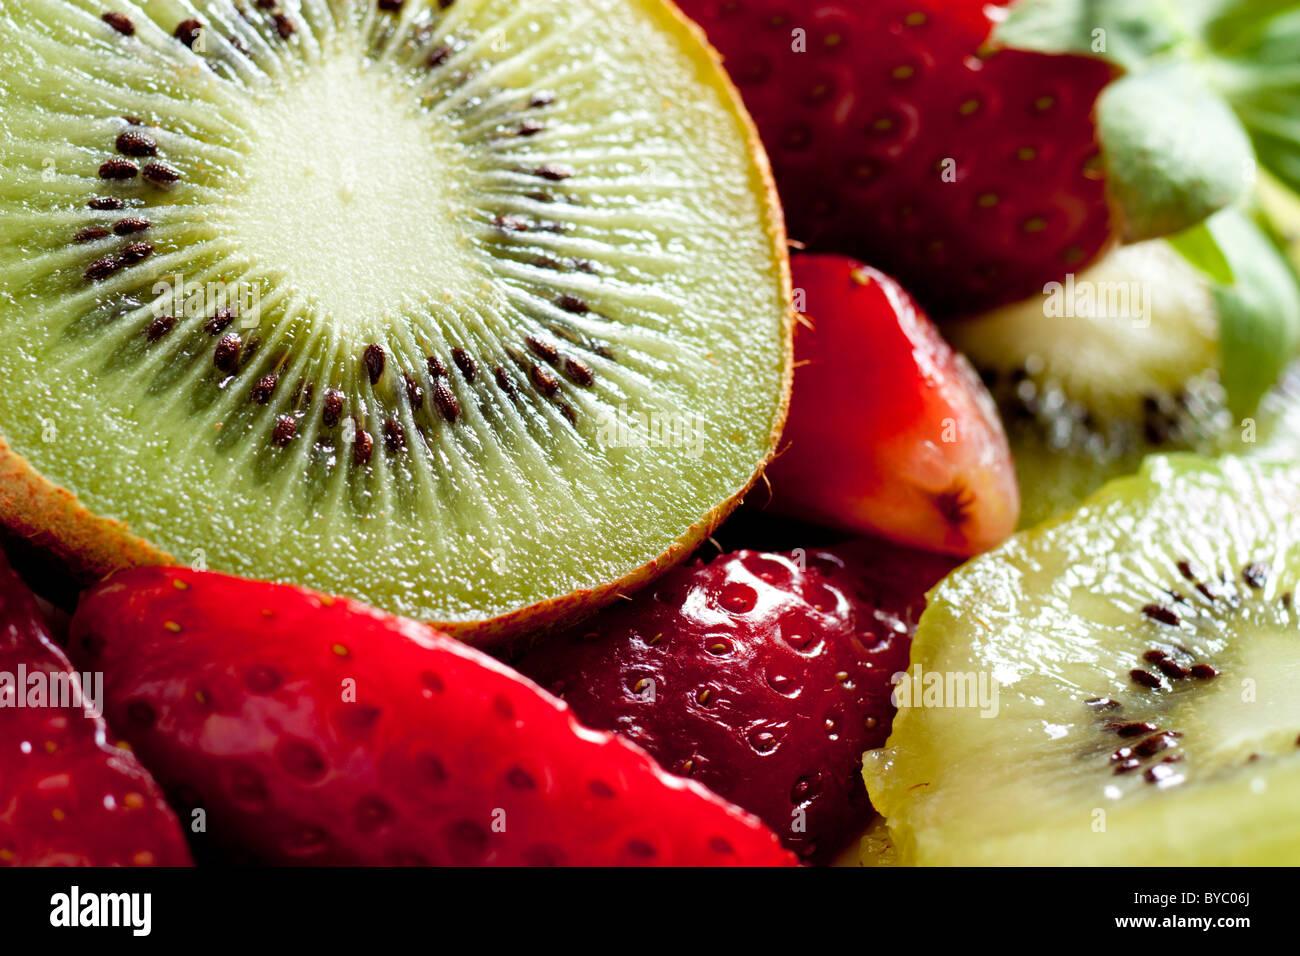 Kiwi with Strawberries - Stock Image